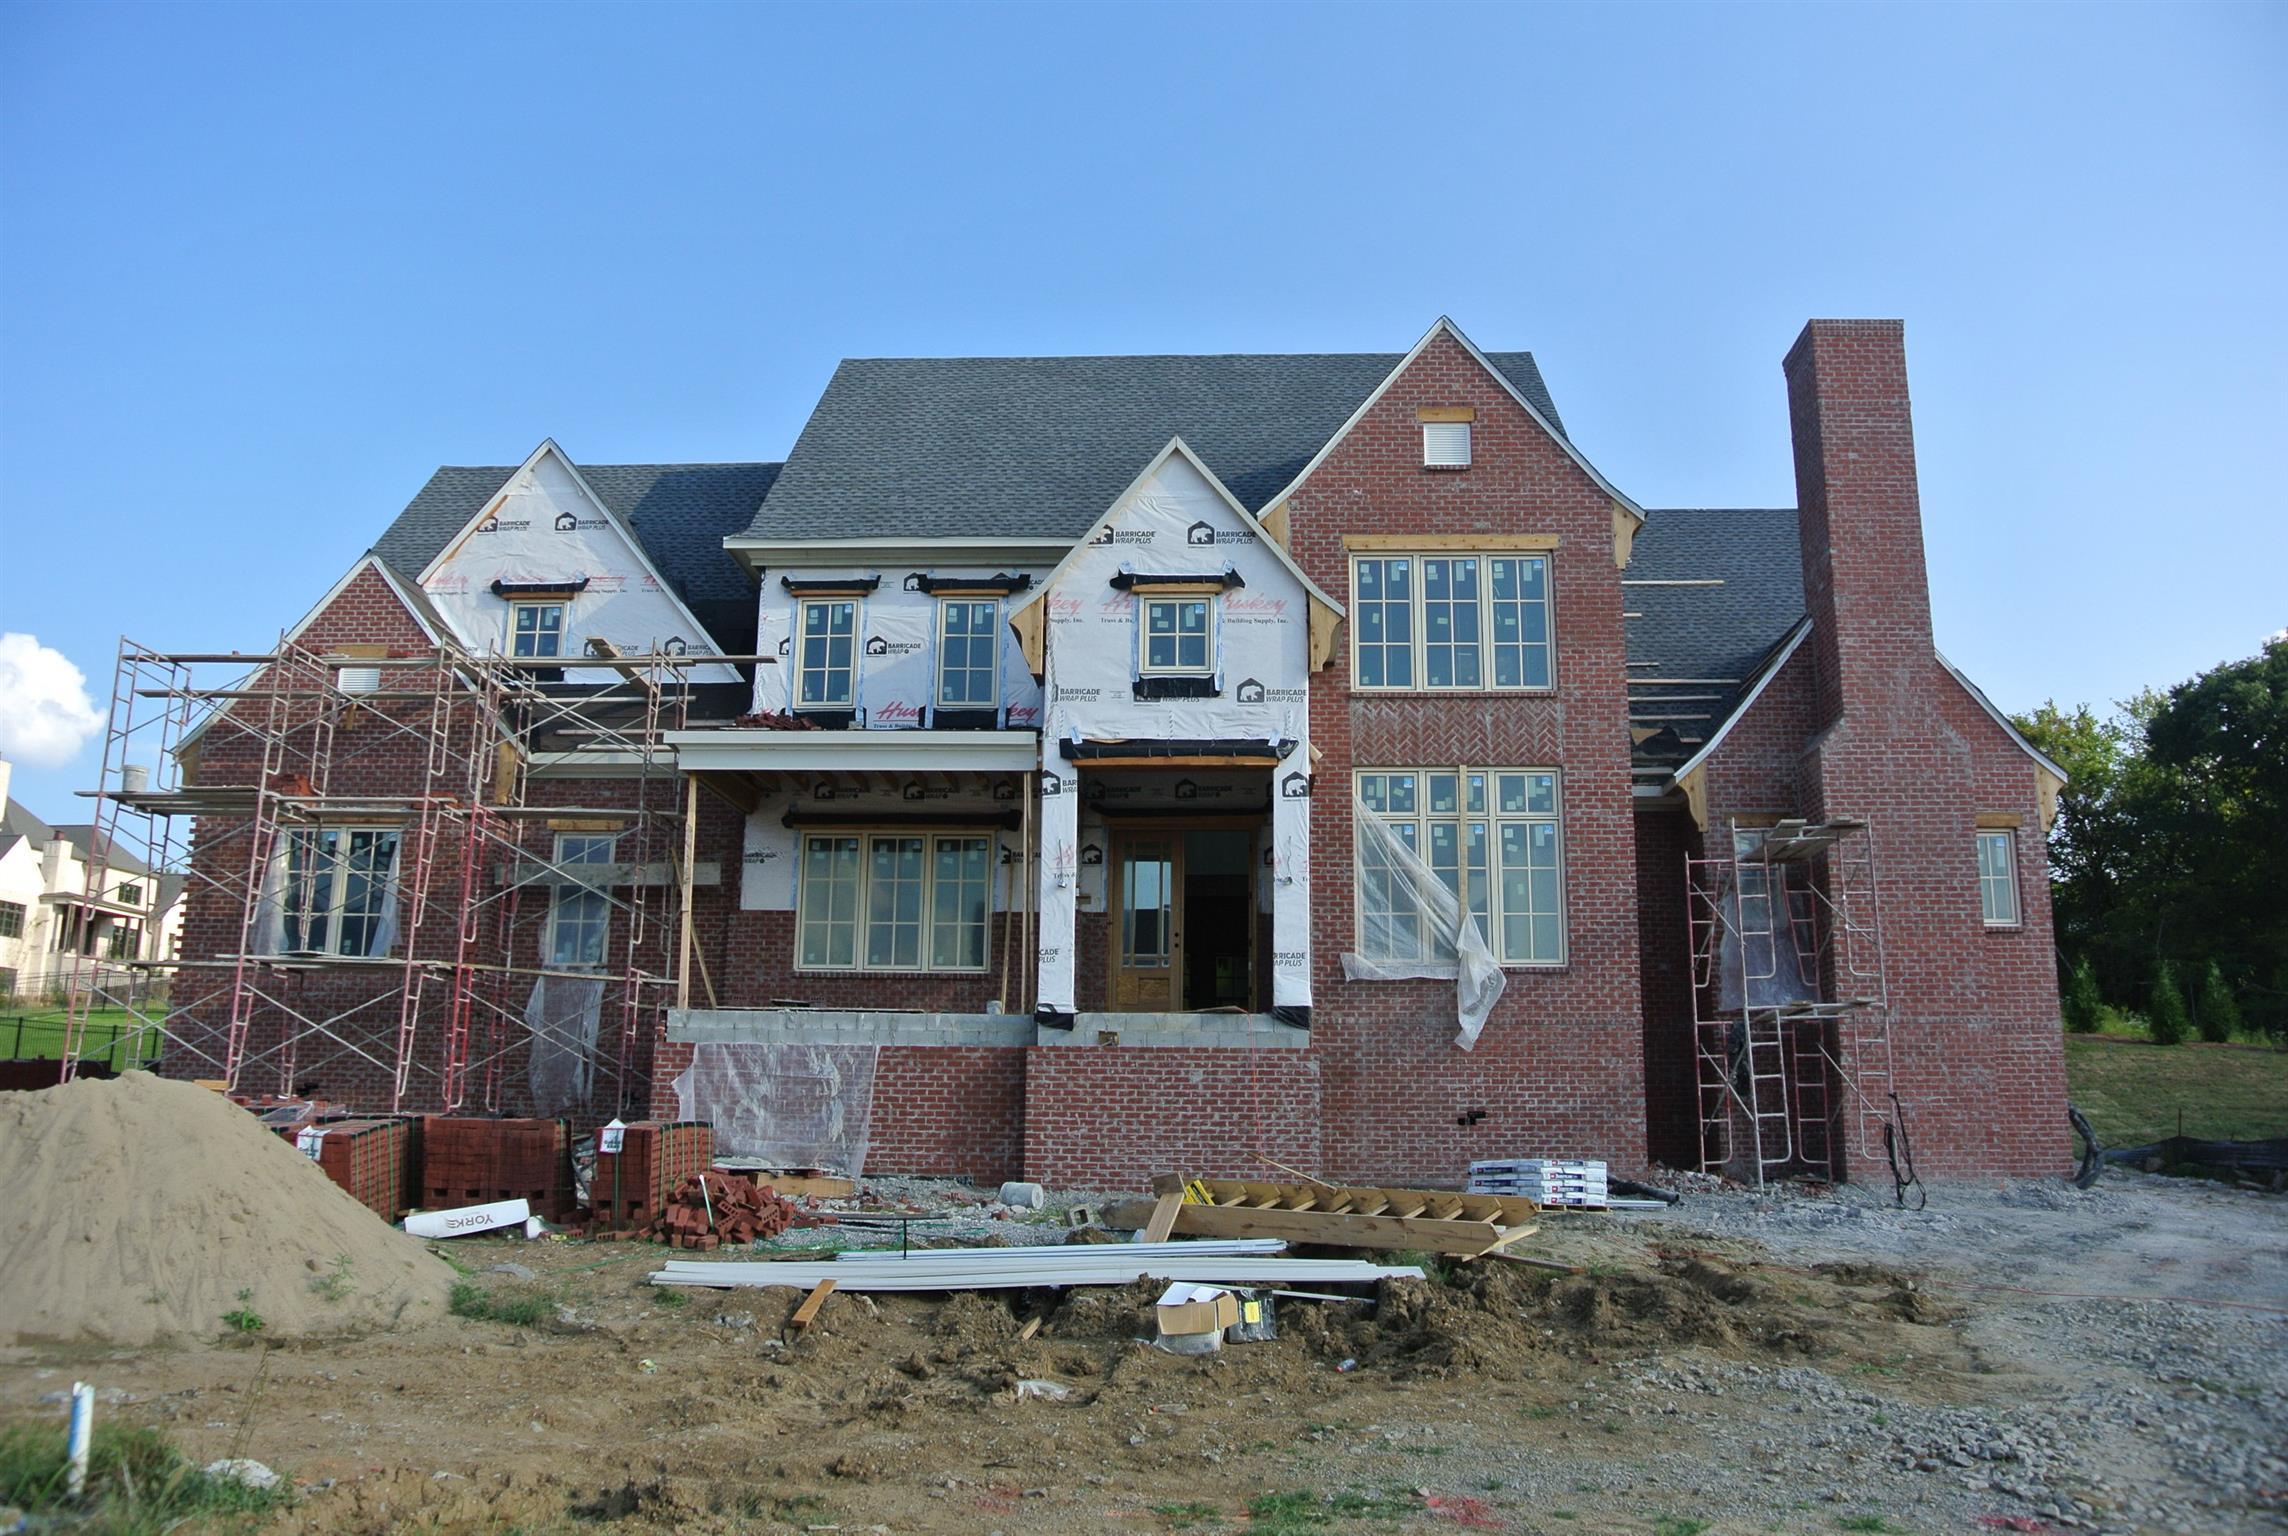 9231 Lehigh Drive (Lot #73), Brentwood, TN 37027 - Brentwood, TN real estate listing